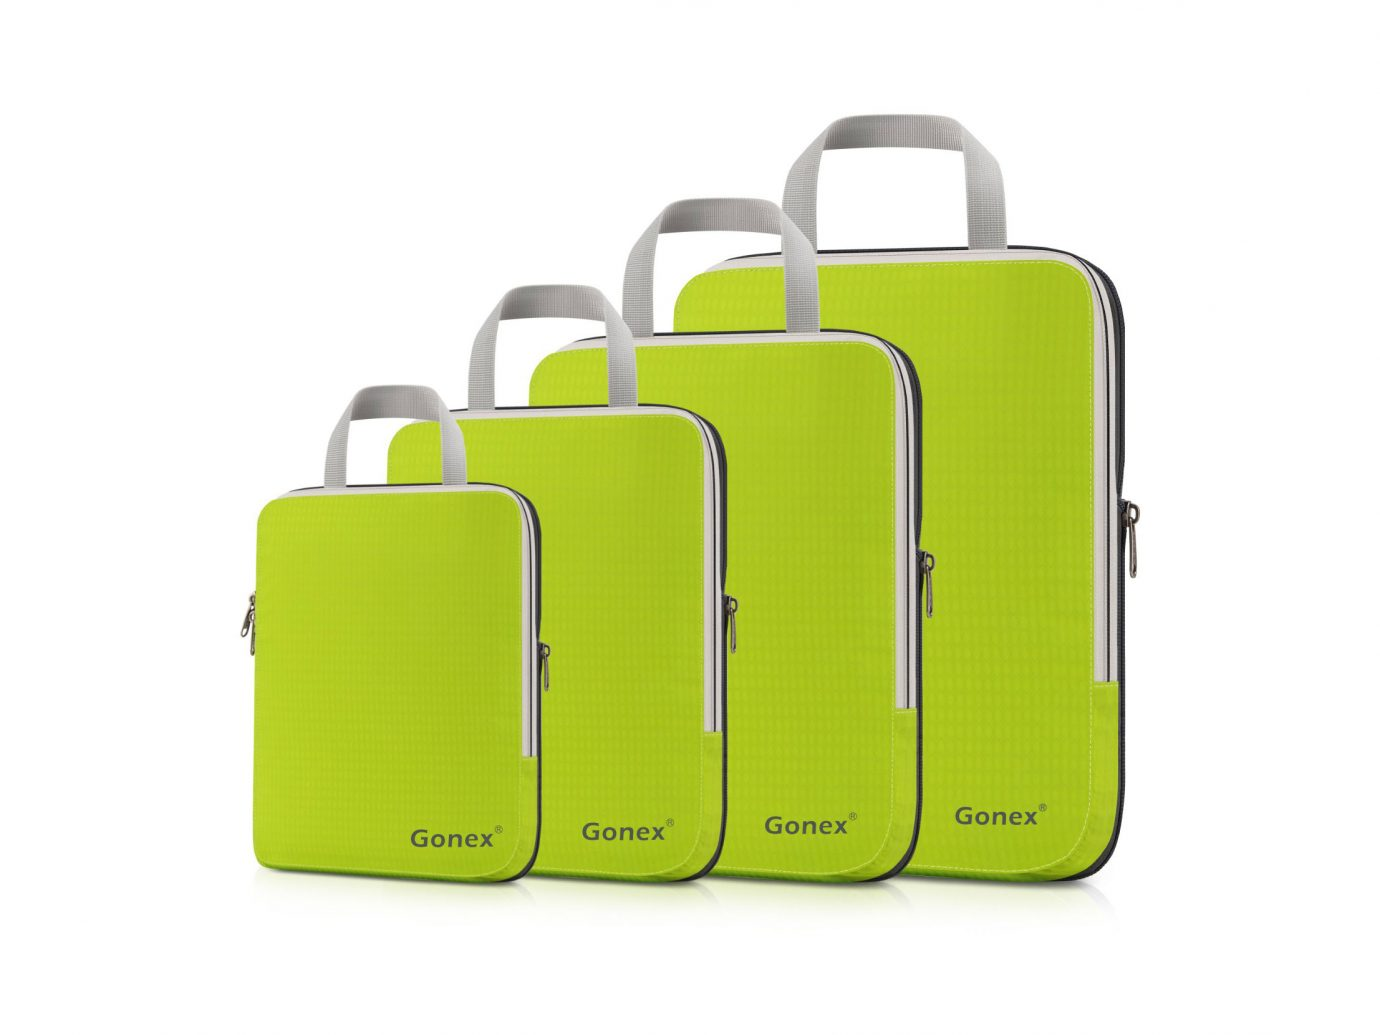 Gonex Compression Packing Cubes